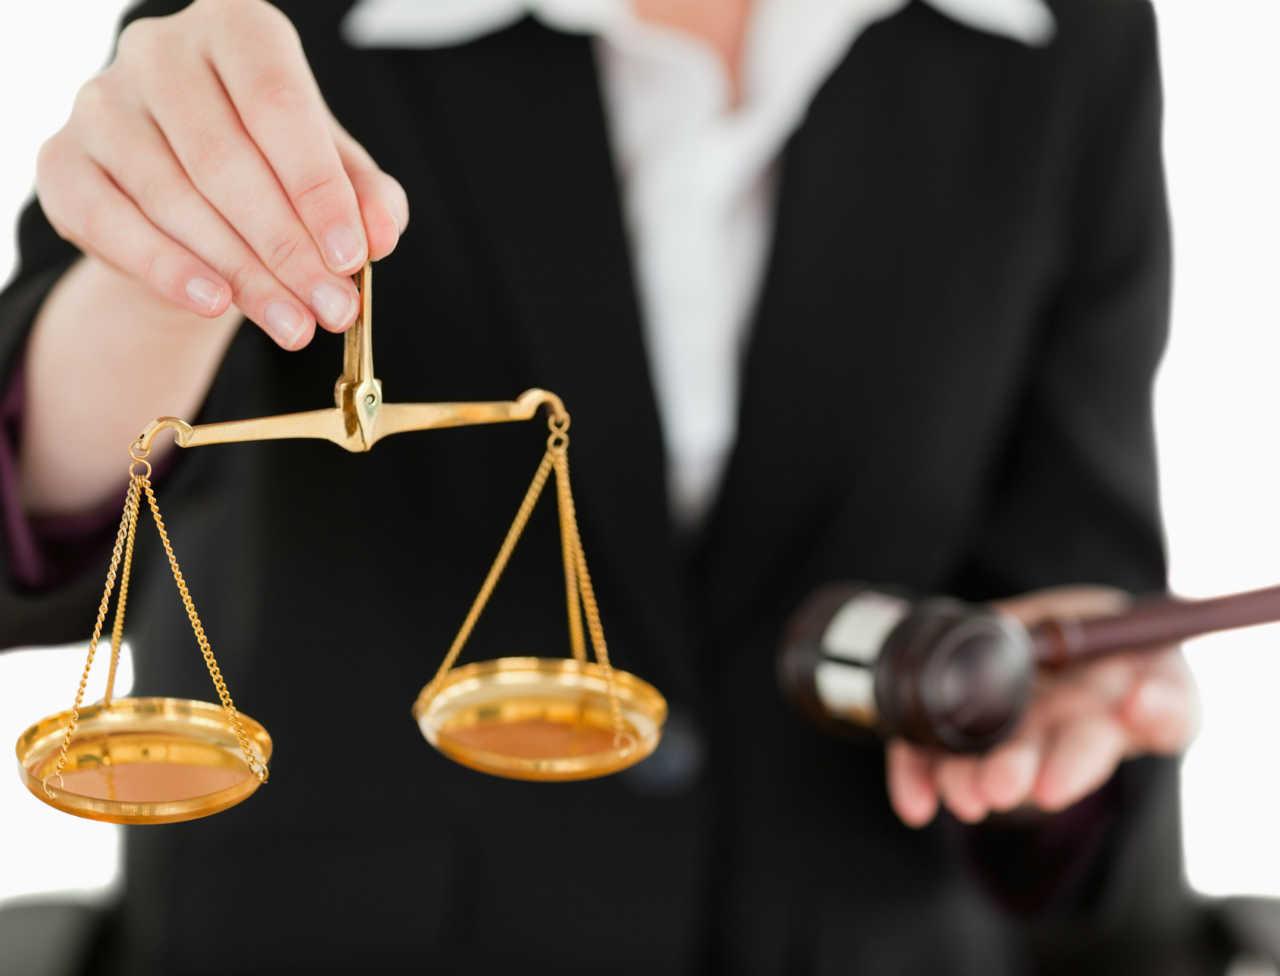 liquidation judiciaire Les effets de la liquidation judiciaire honoraires